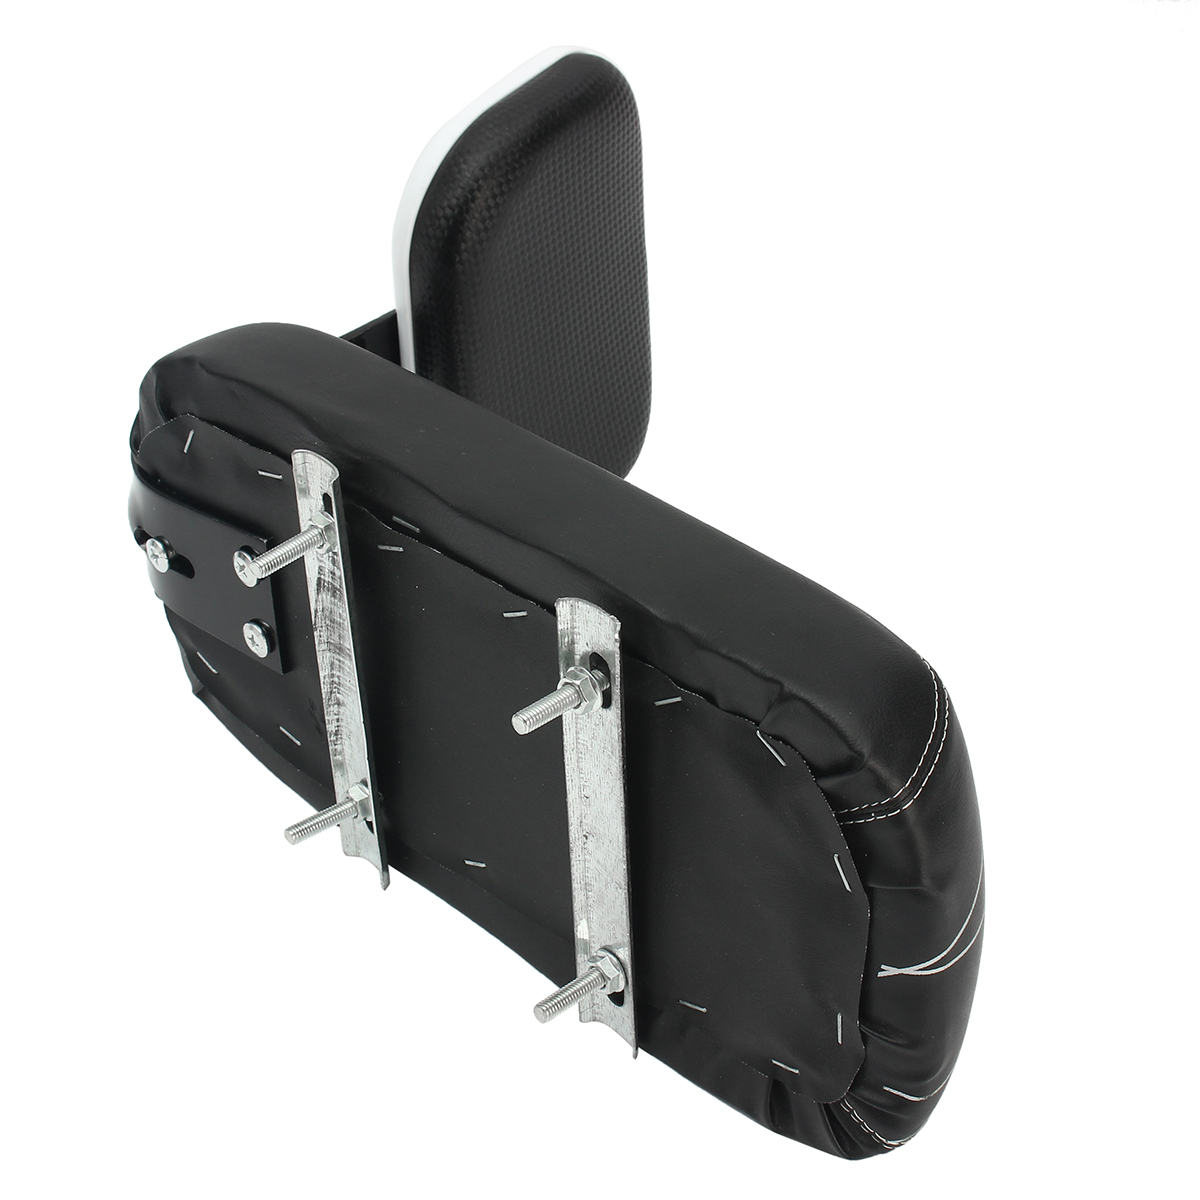 Bicycle Comfort Gel Rear Bike Seat Pad Cushion Cover Back Rest Saddle ~ Black